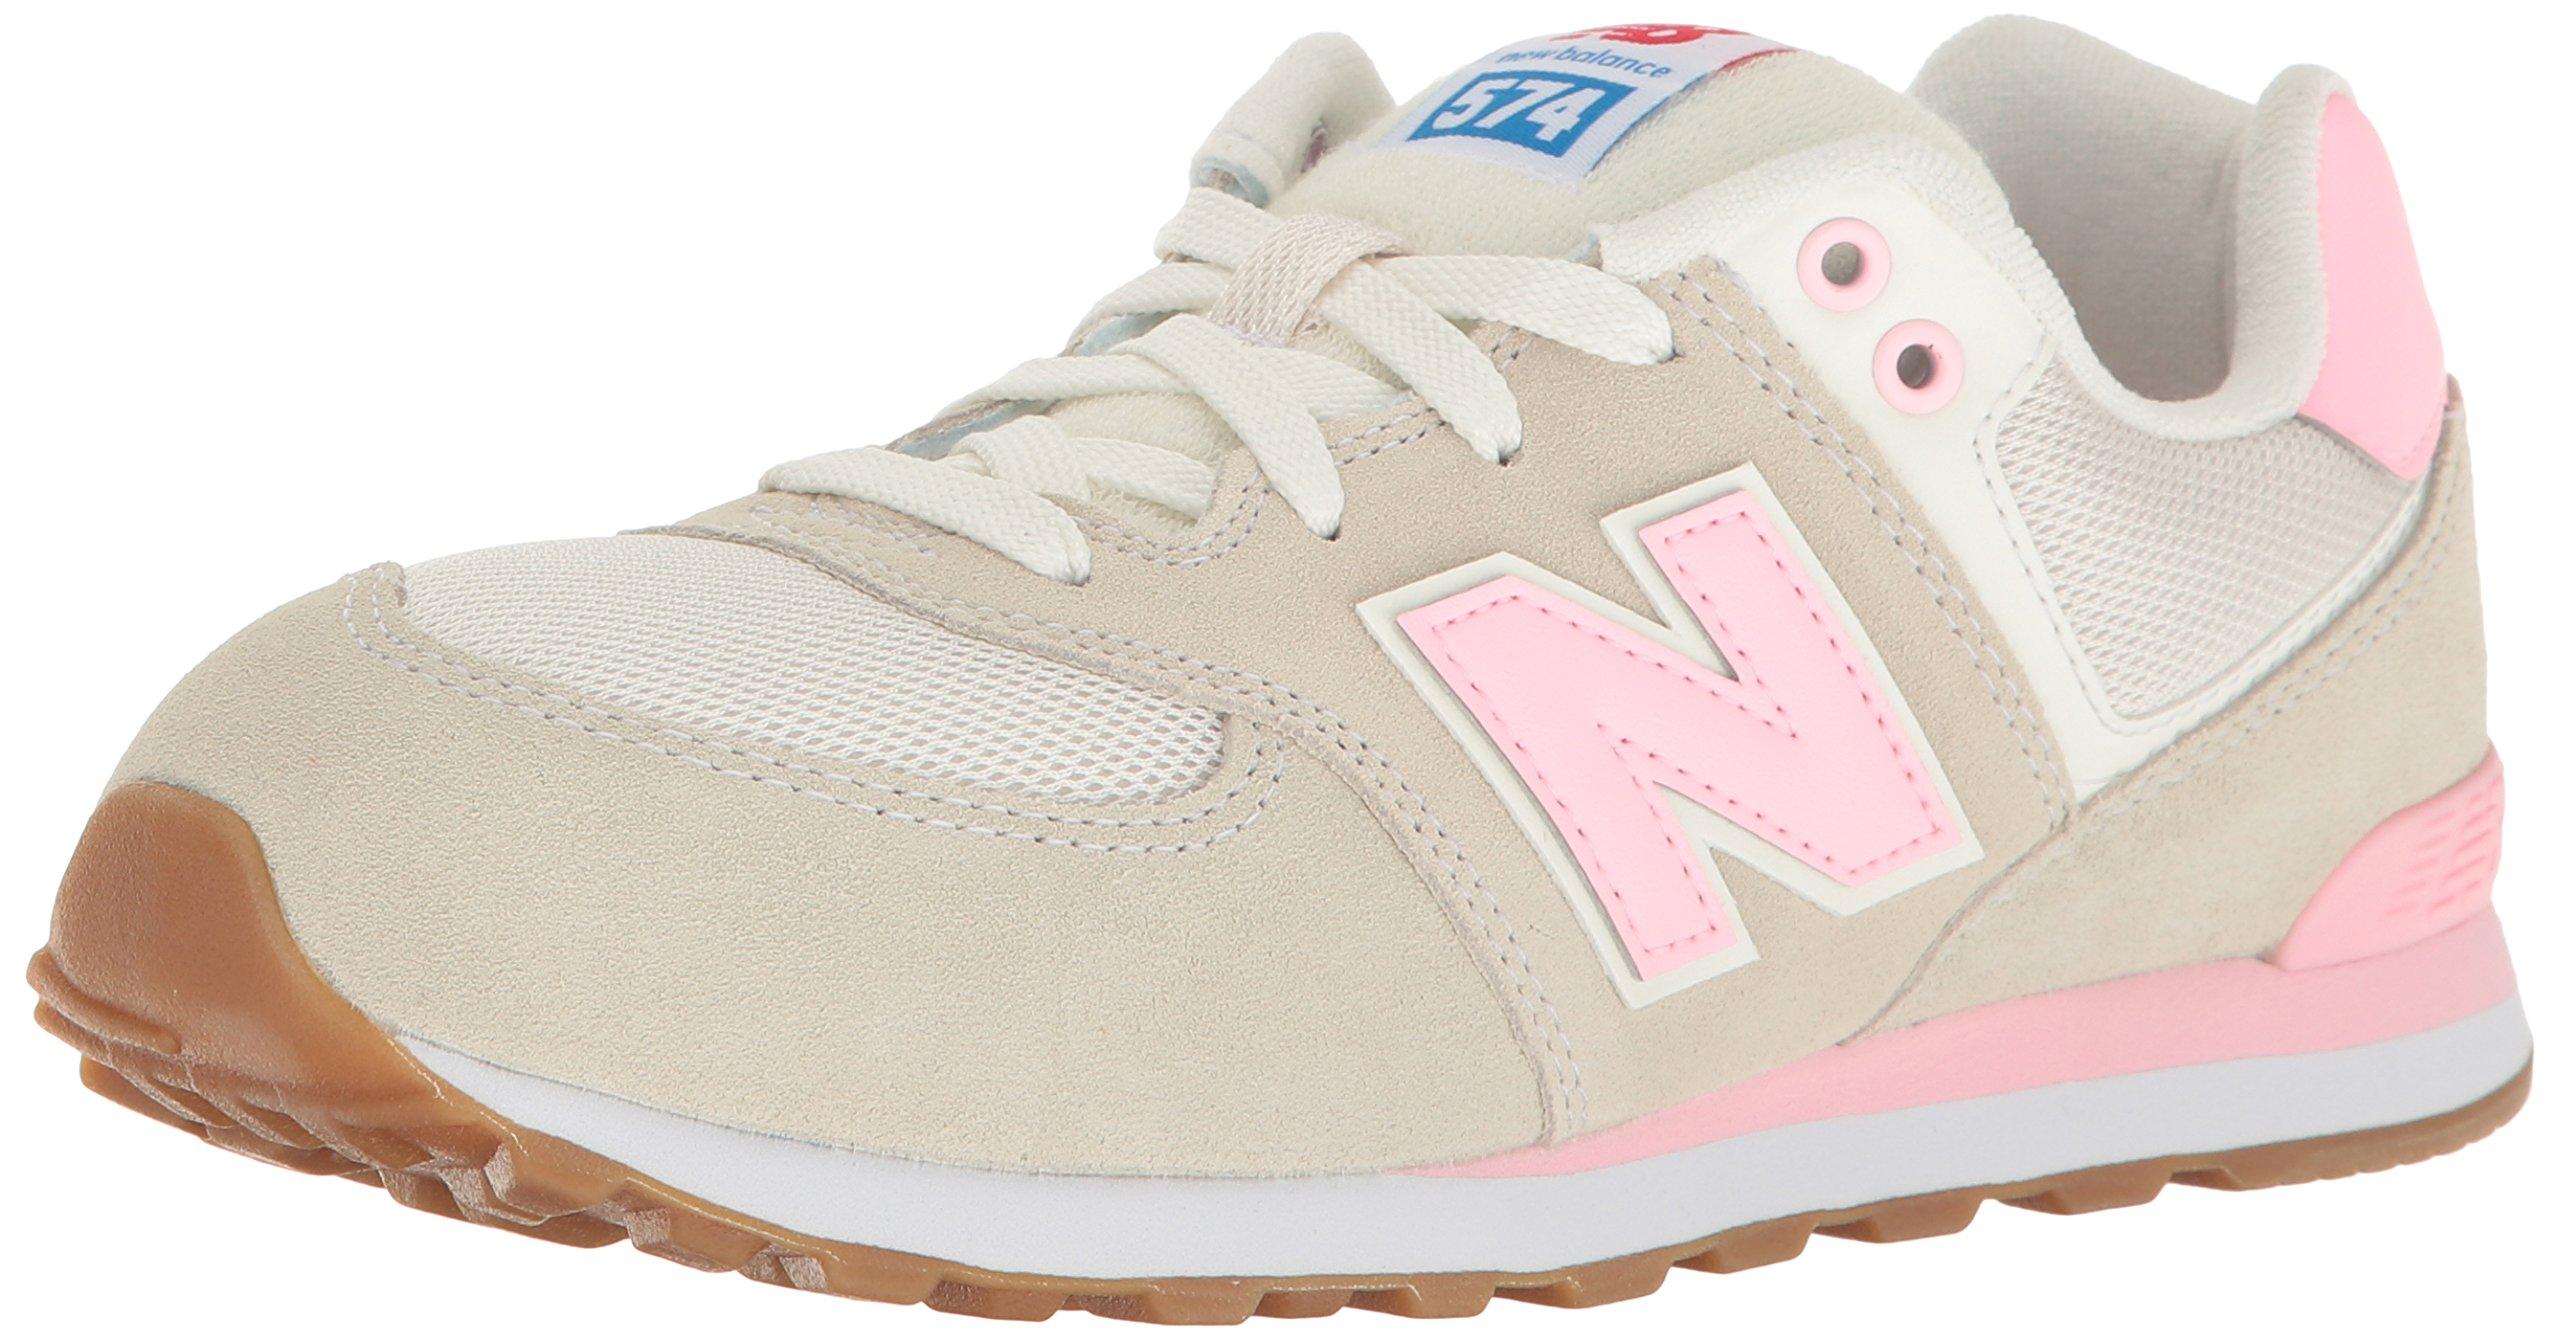 New Balance Girls' 574 Fashion Sneaker Retro Sport (BK) Running Shoe, Pink/White, 7 M US Big Kid